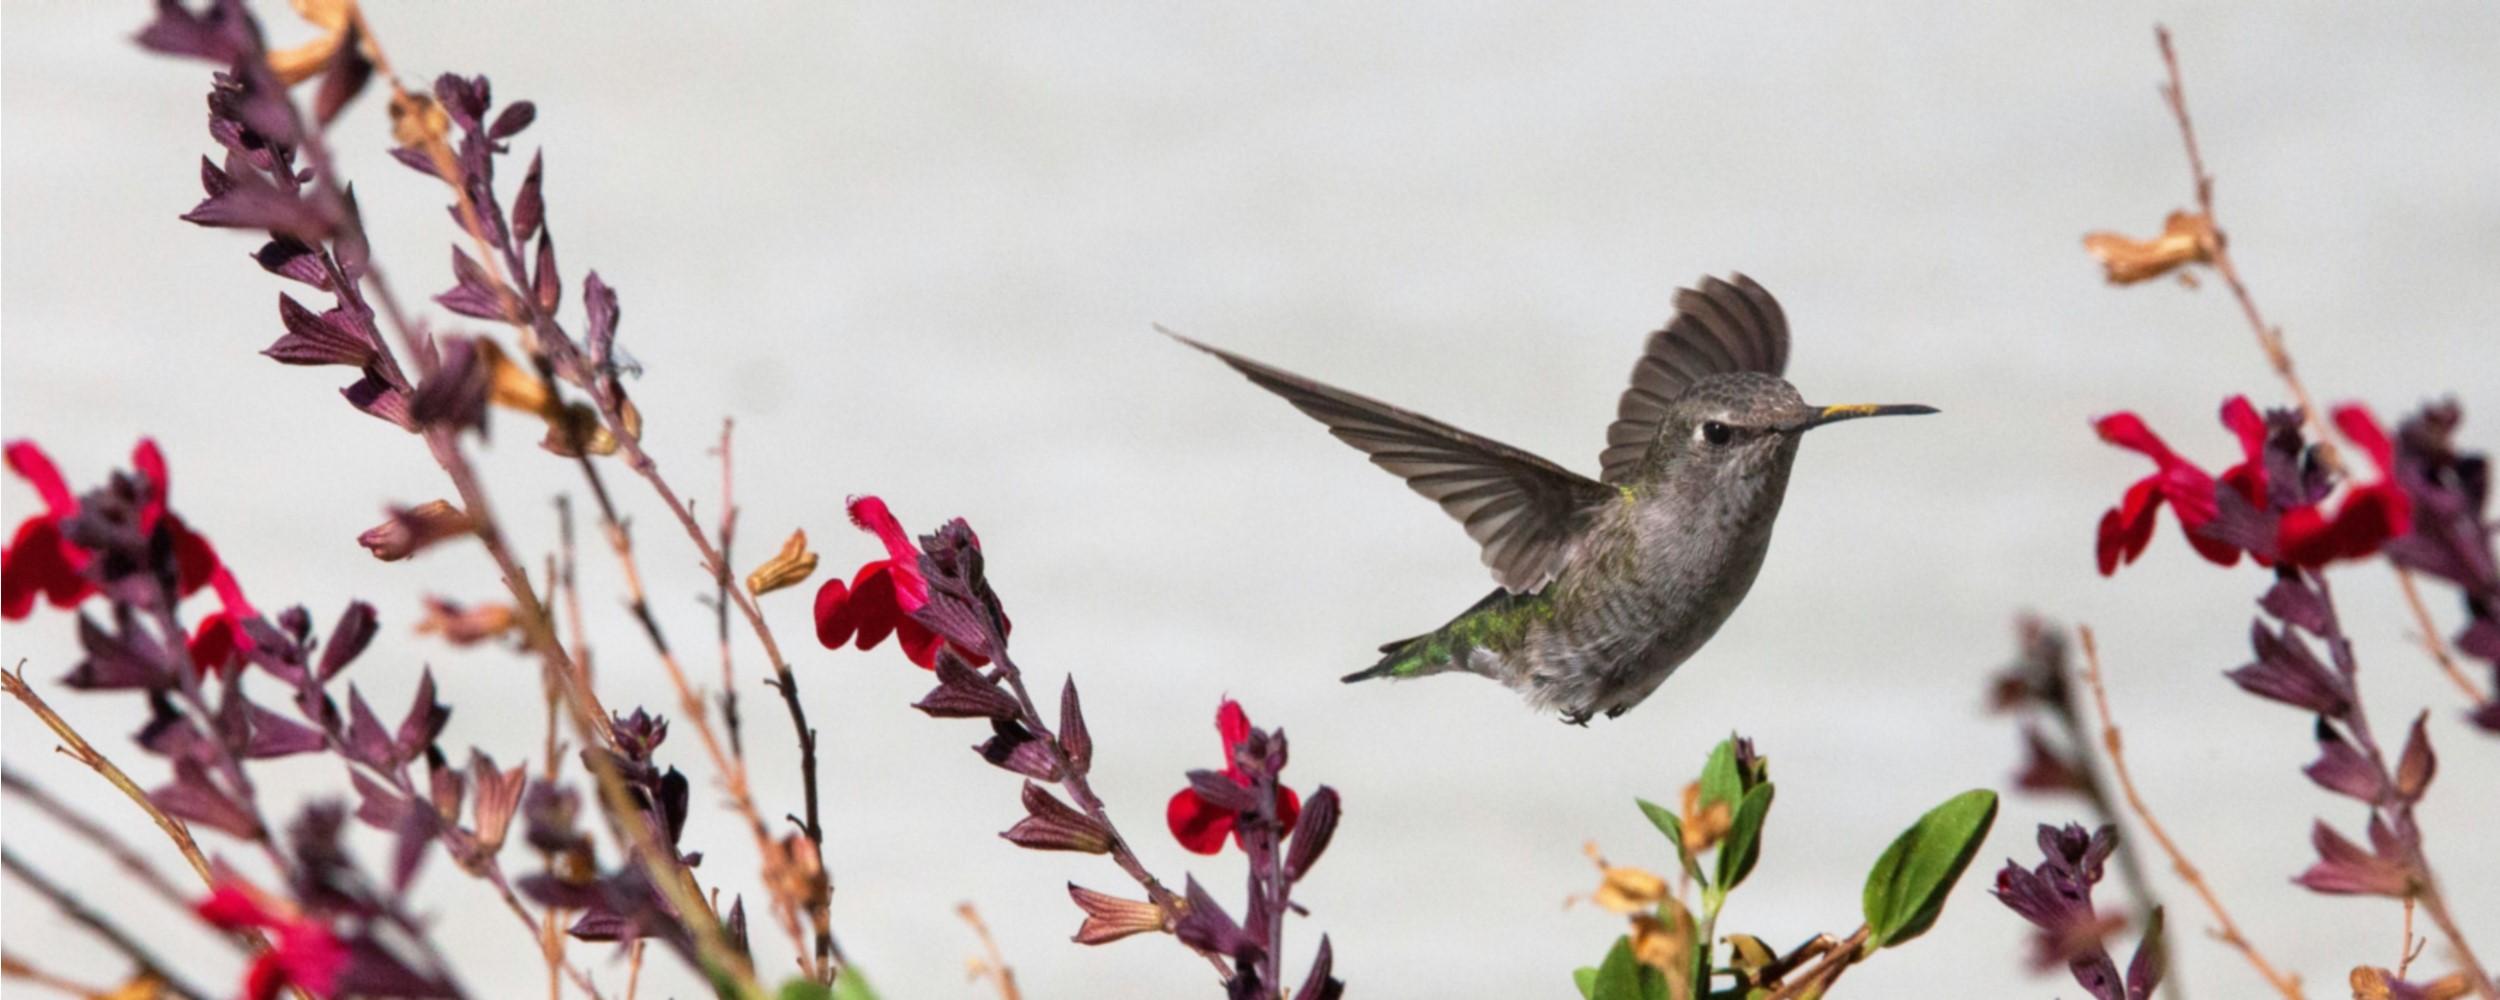 Home - Hummingbird - 2500x1000